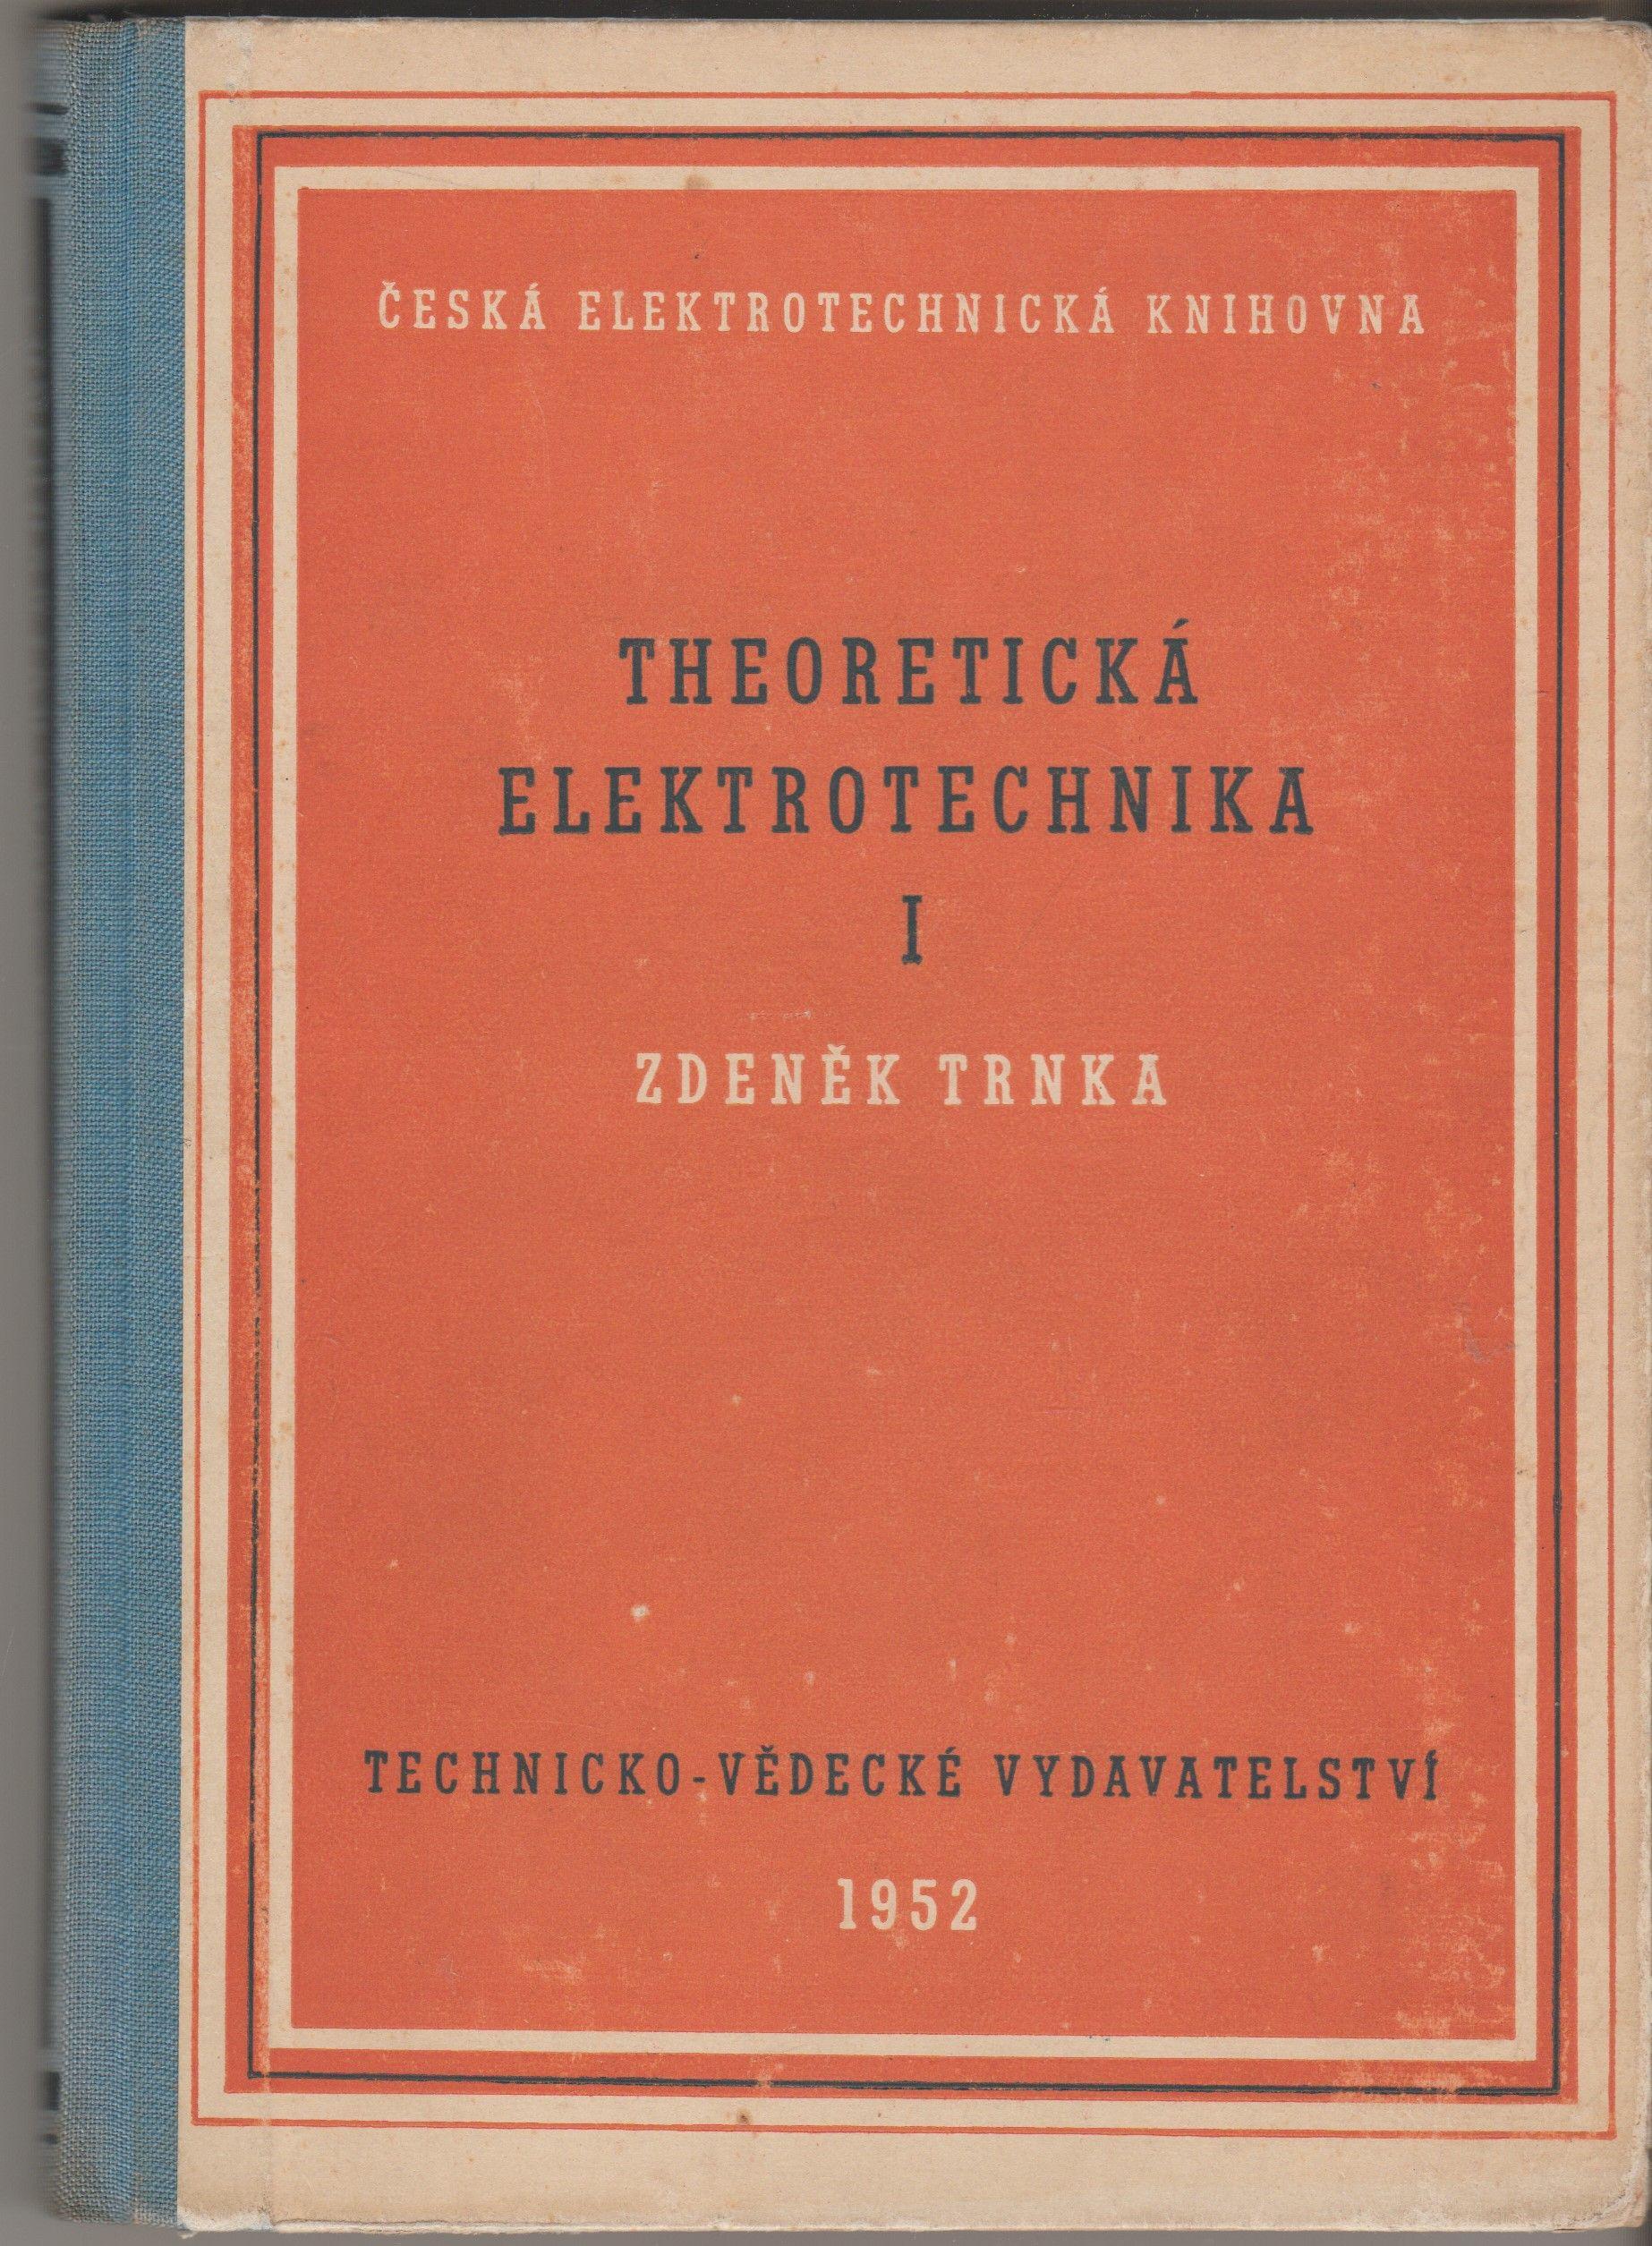 Theoretická elektrotechnika I - Zdeněk Trnka